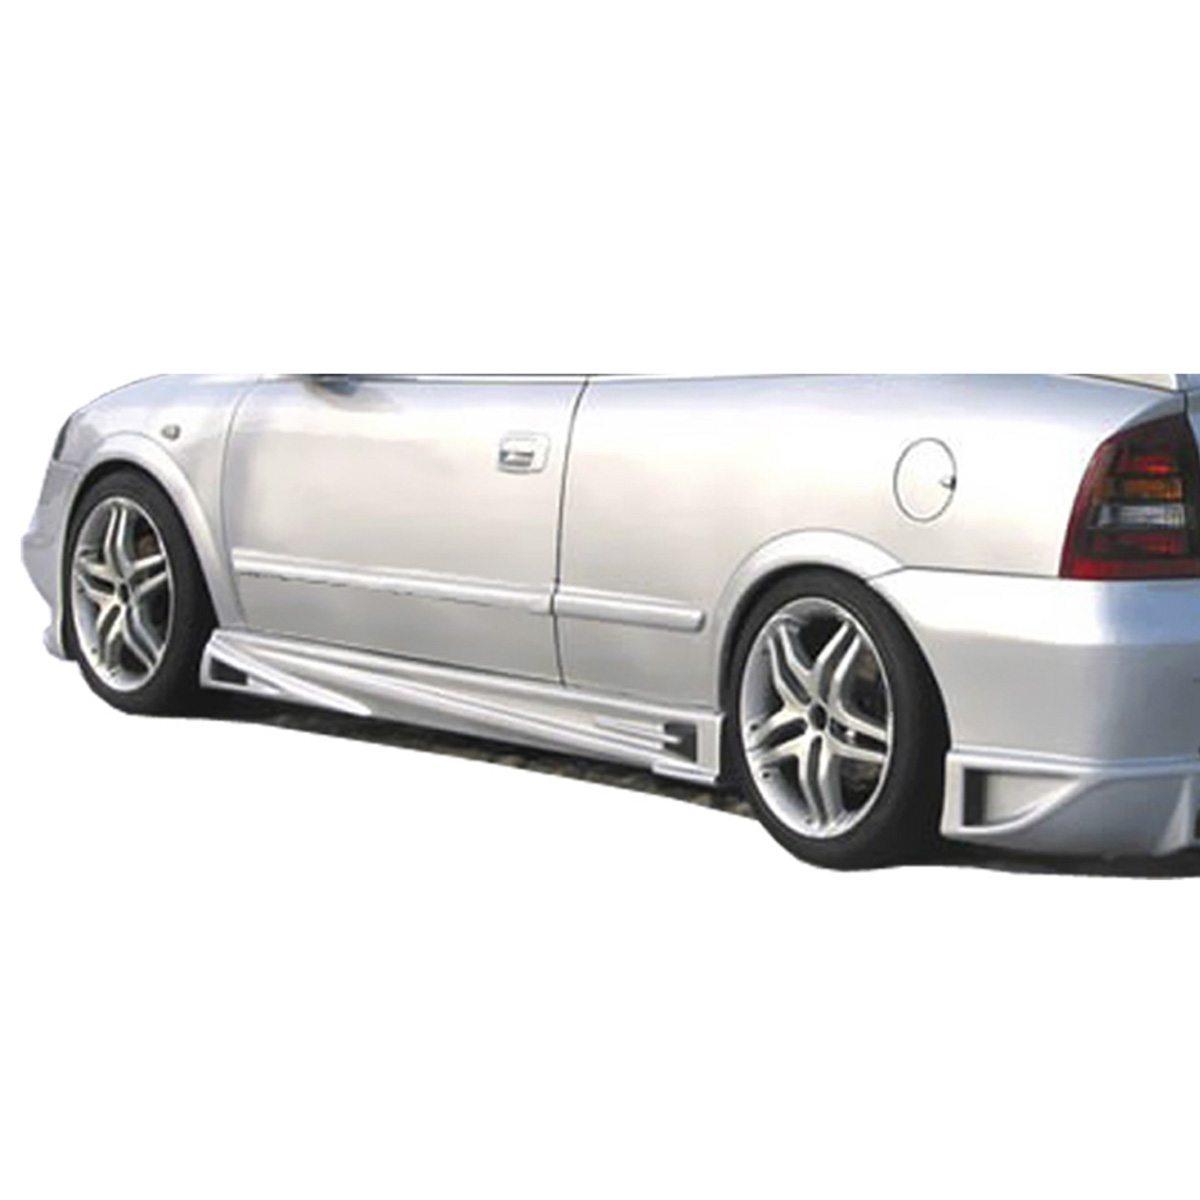 Opel-Astra-G-Hero-Emb-EBU0152